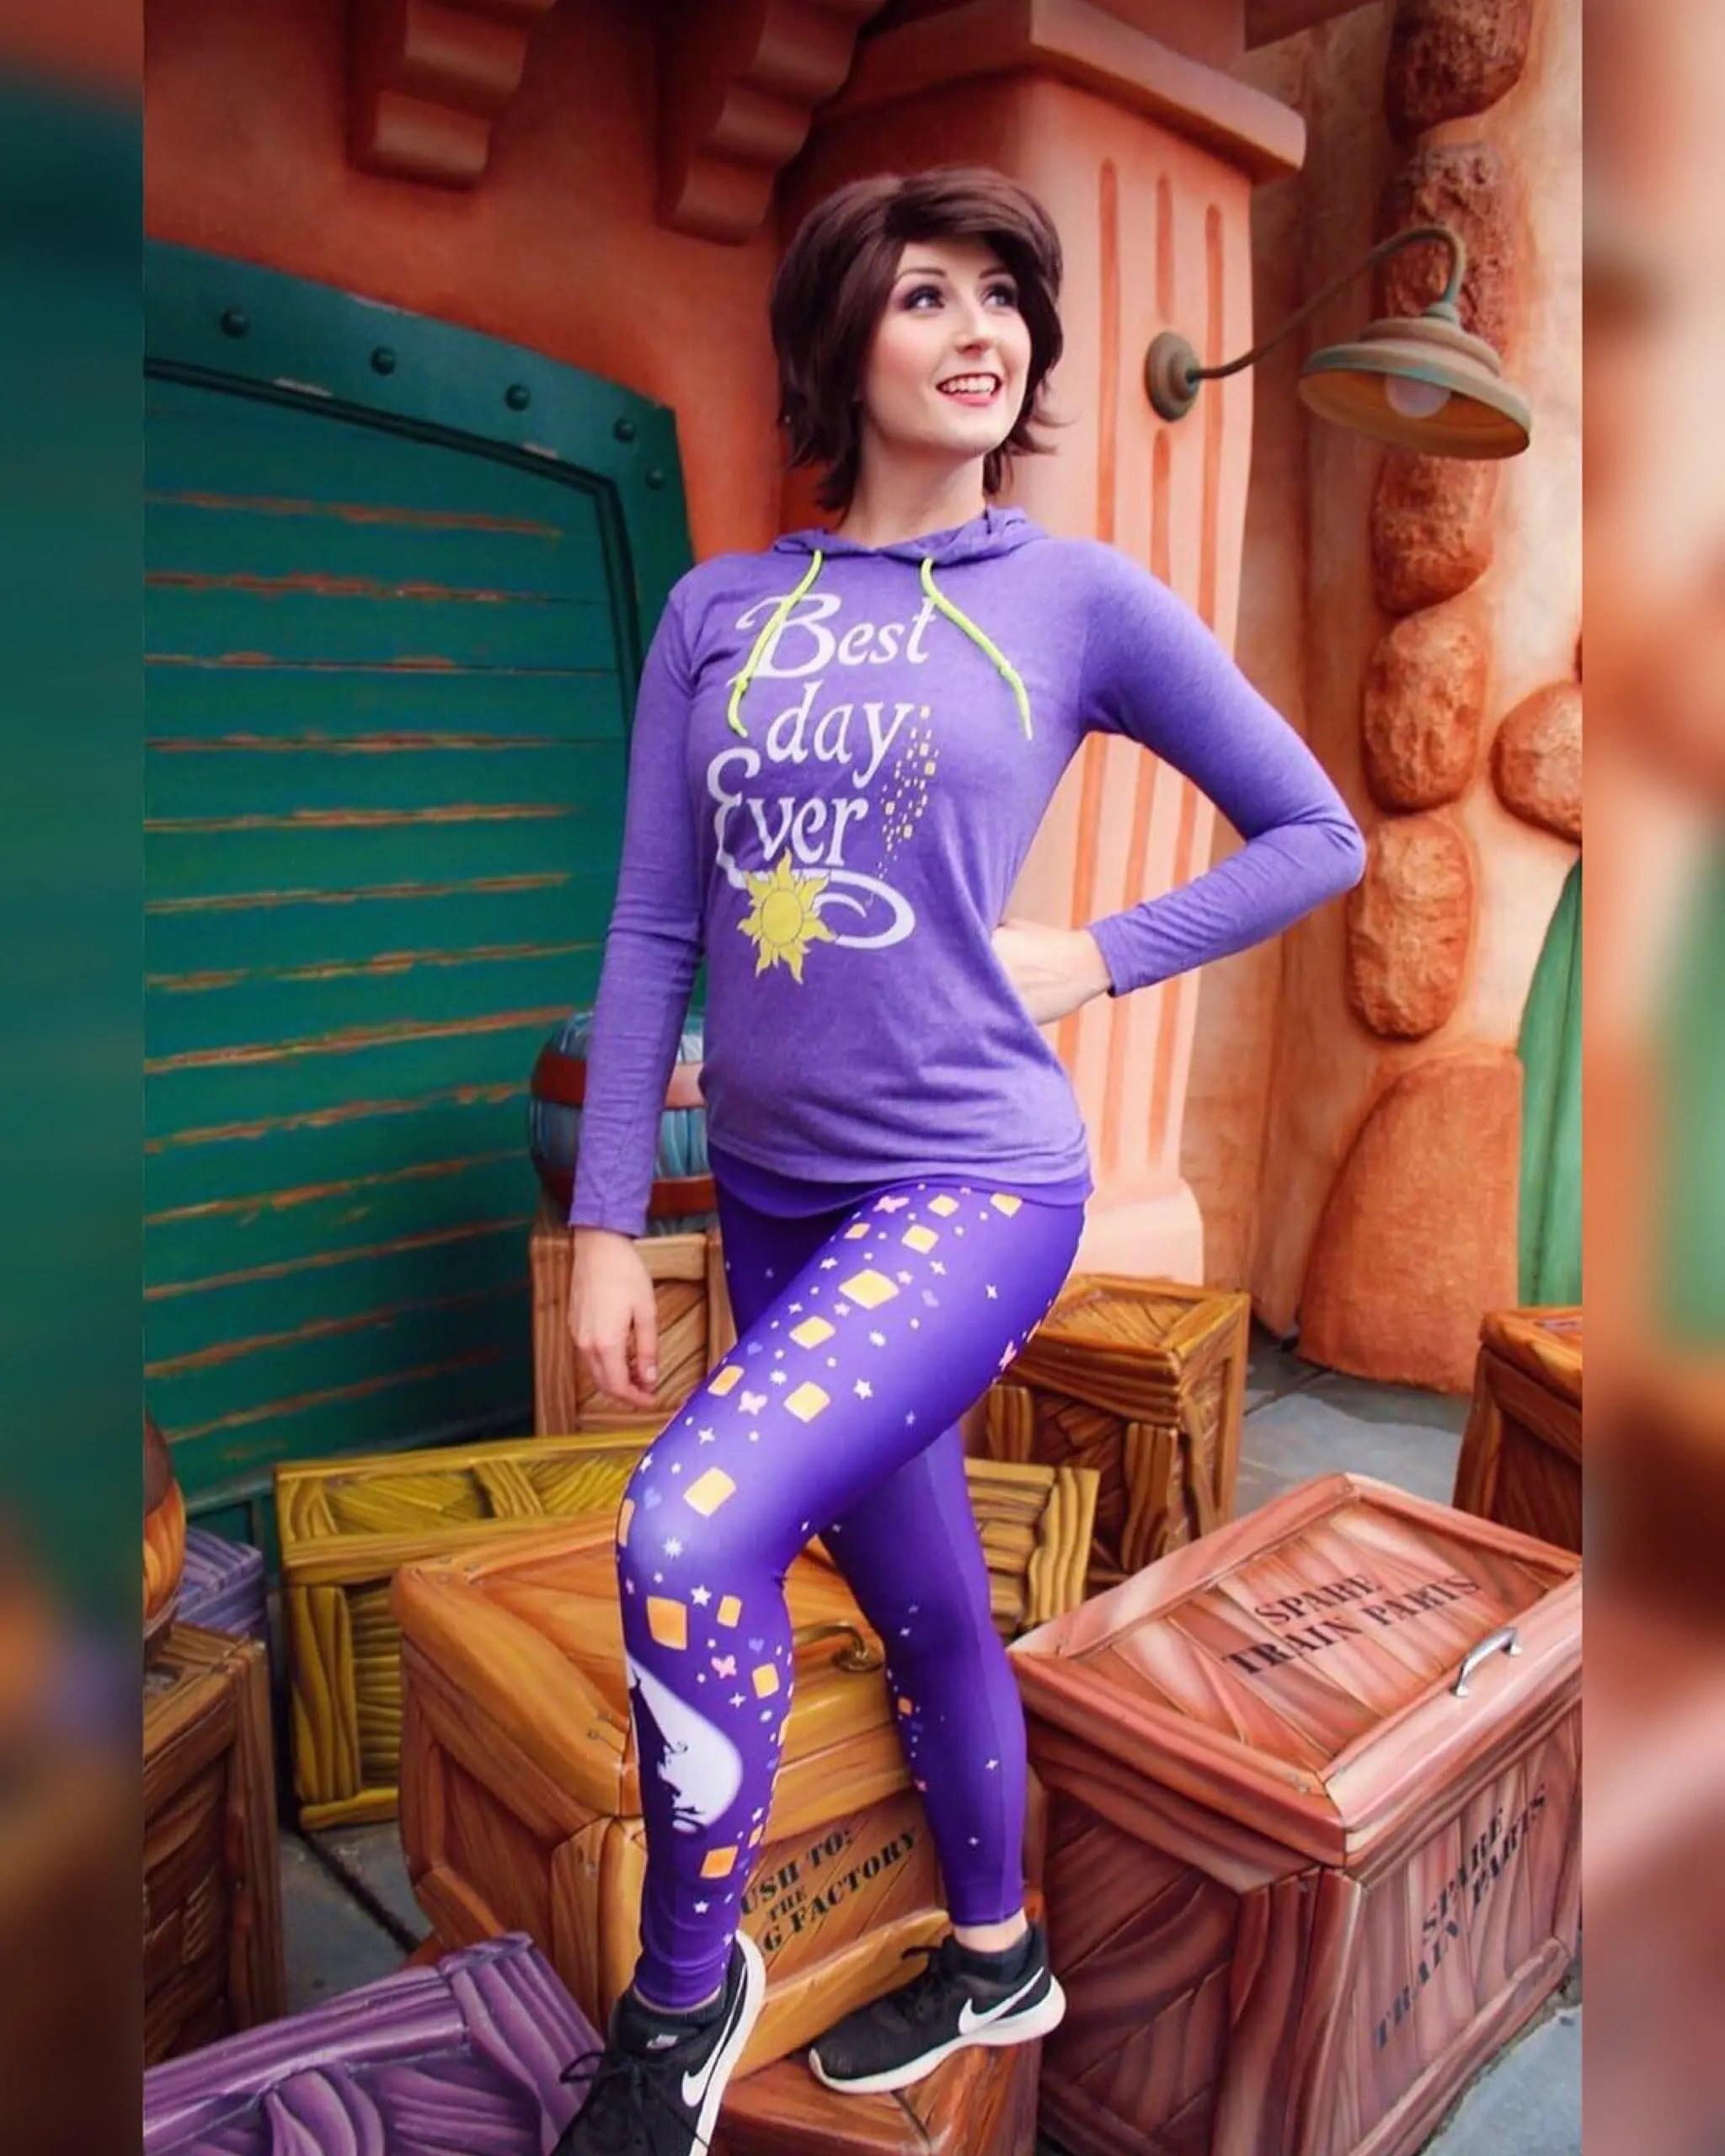 Rapunzel_fitness-leggings-and-shirts